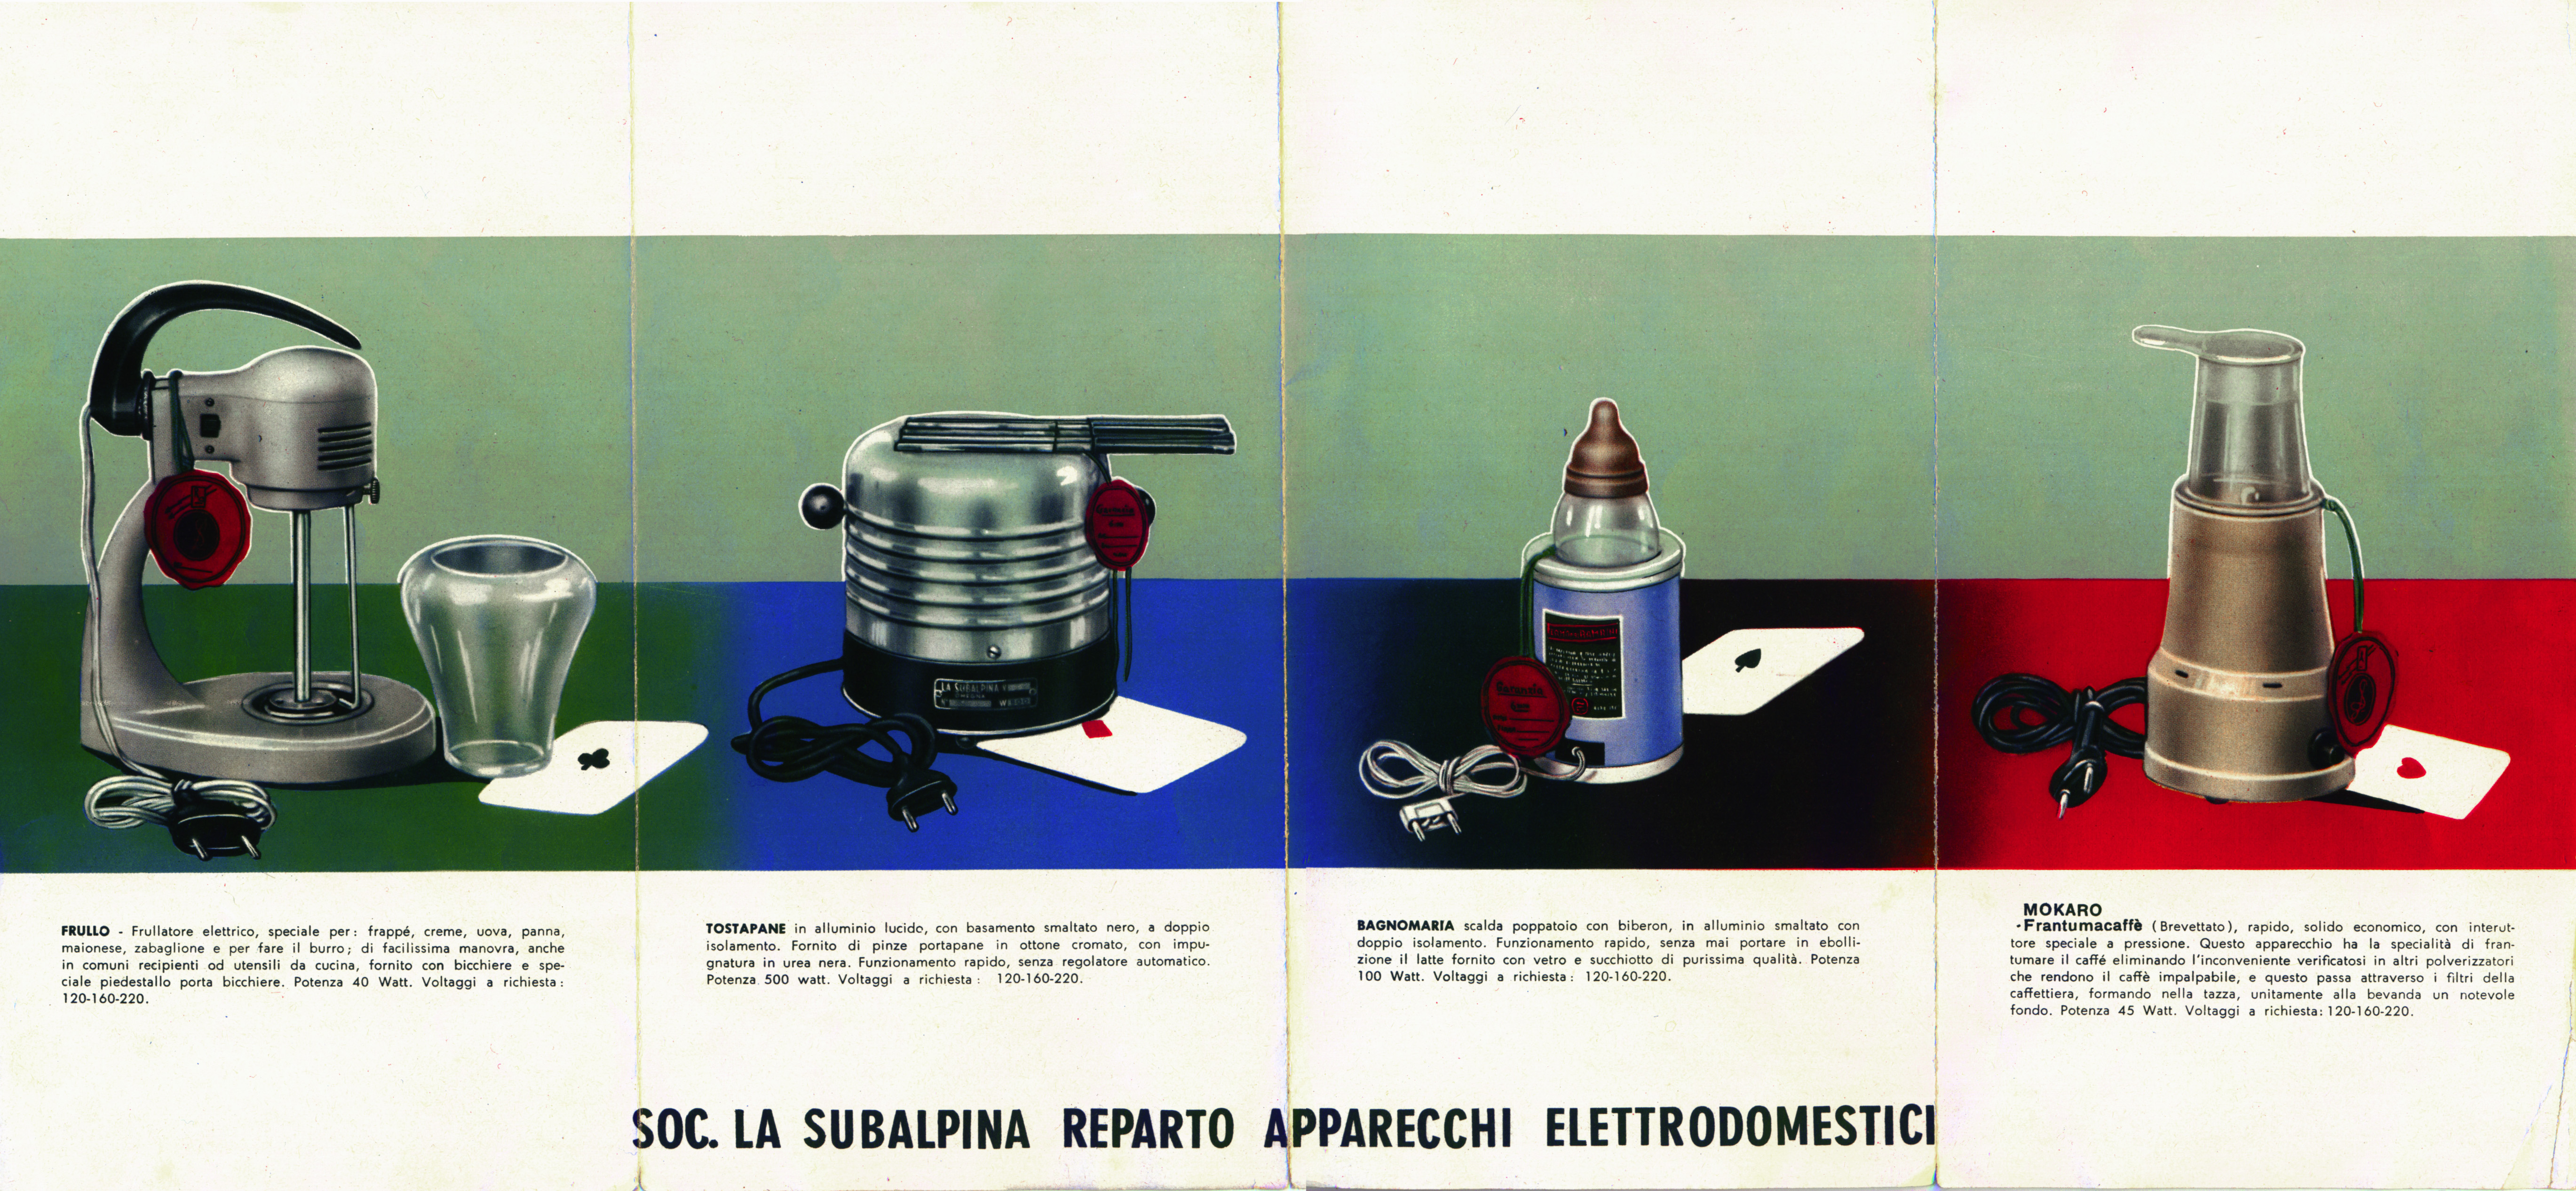 Catalogo prodotti La Subalpina, 1956.